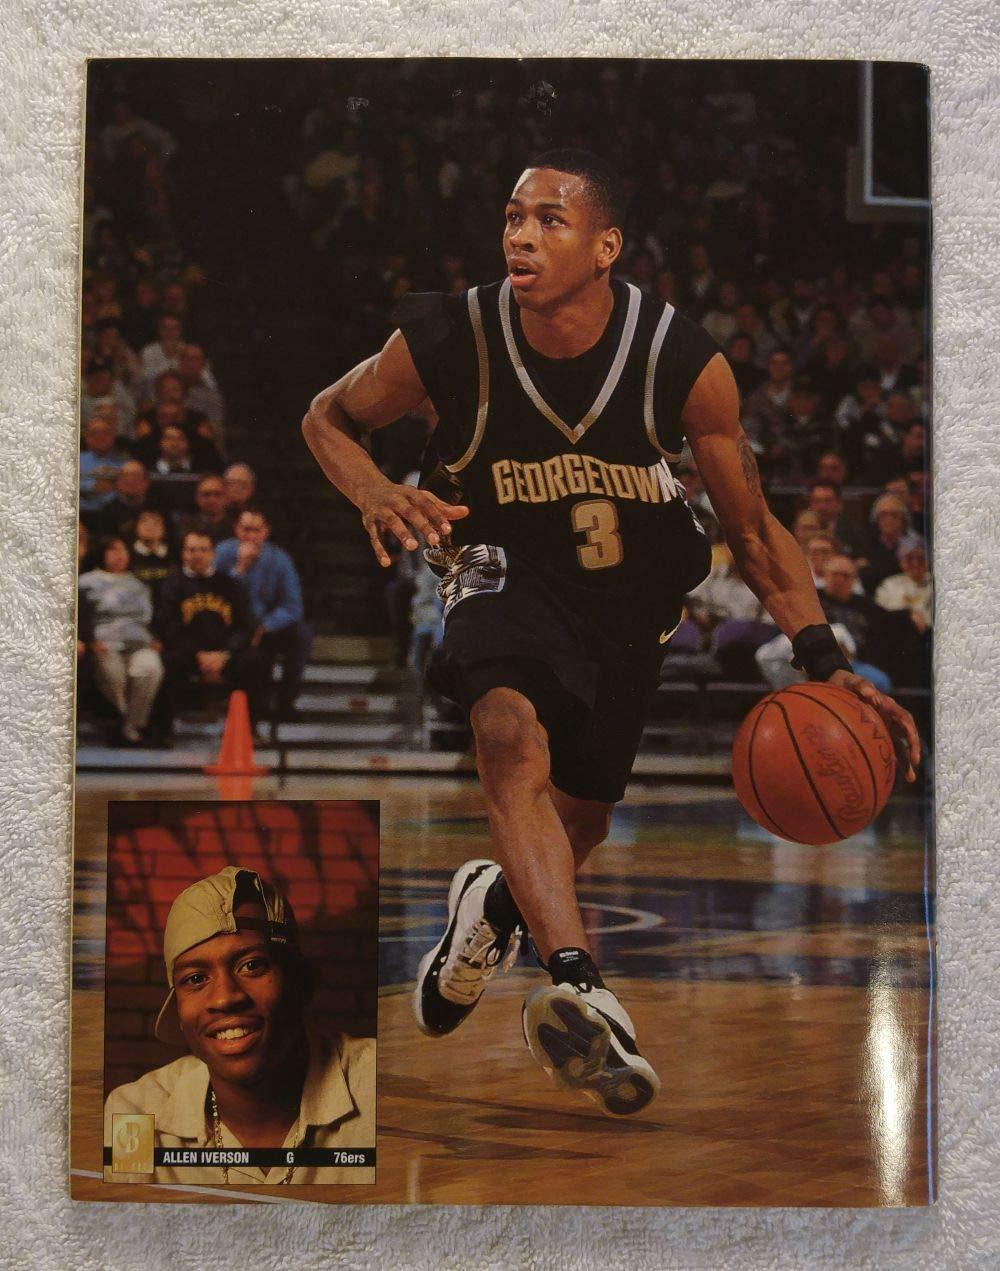 b59875844d39 Michael Jordan - Chicago Bulls - Beckett Basketball Monthly Magazine -  74  - September 1996 - Back Cover  Allen Iverson (Georgetown Hoyas) at Amazon s  ...